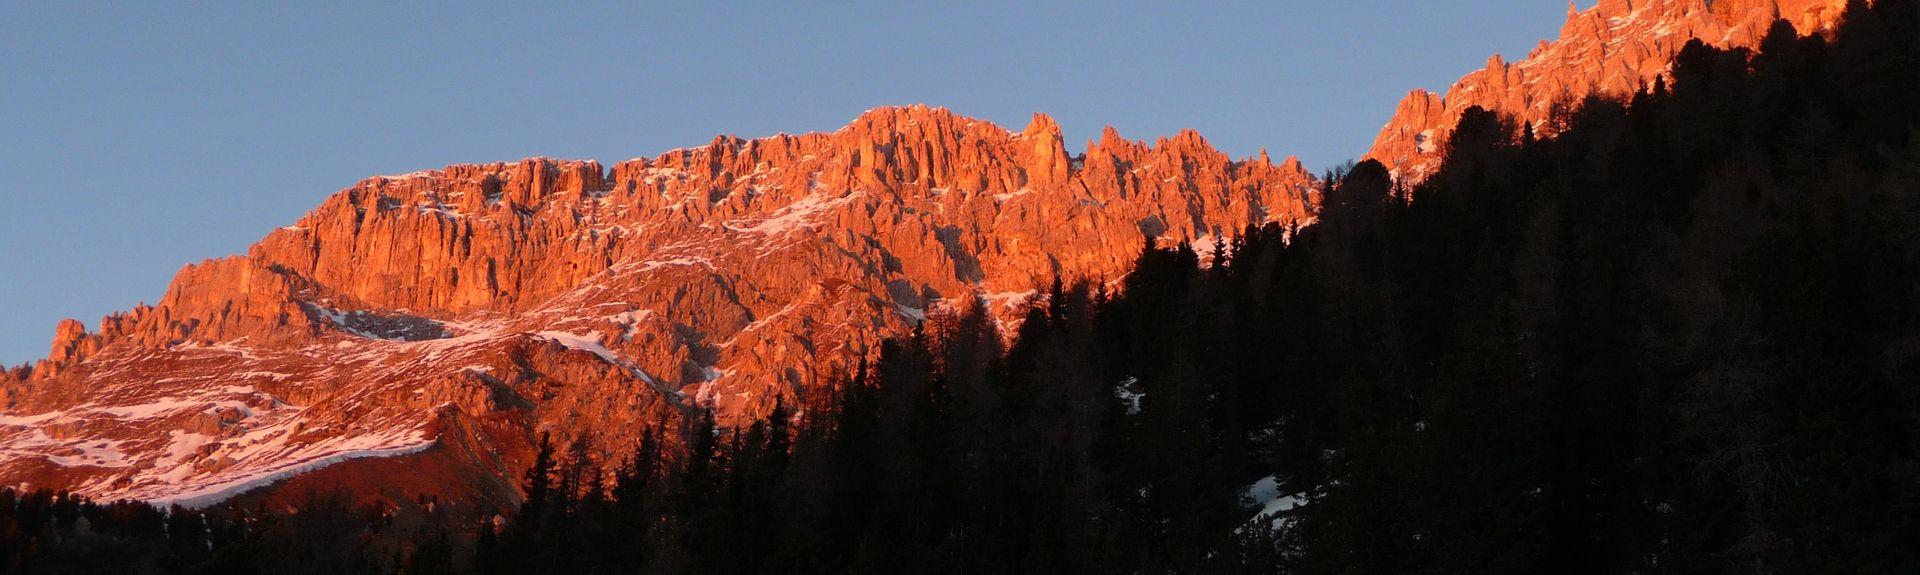 Bolzano, Trentino-Zuid-Tirol, Italië